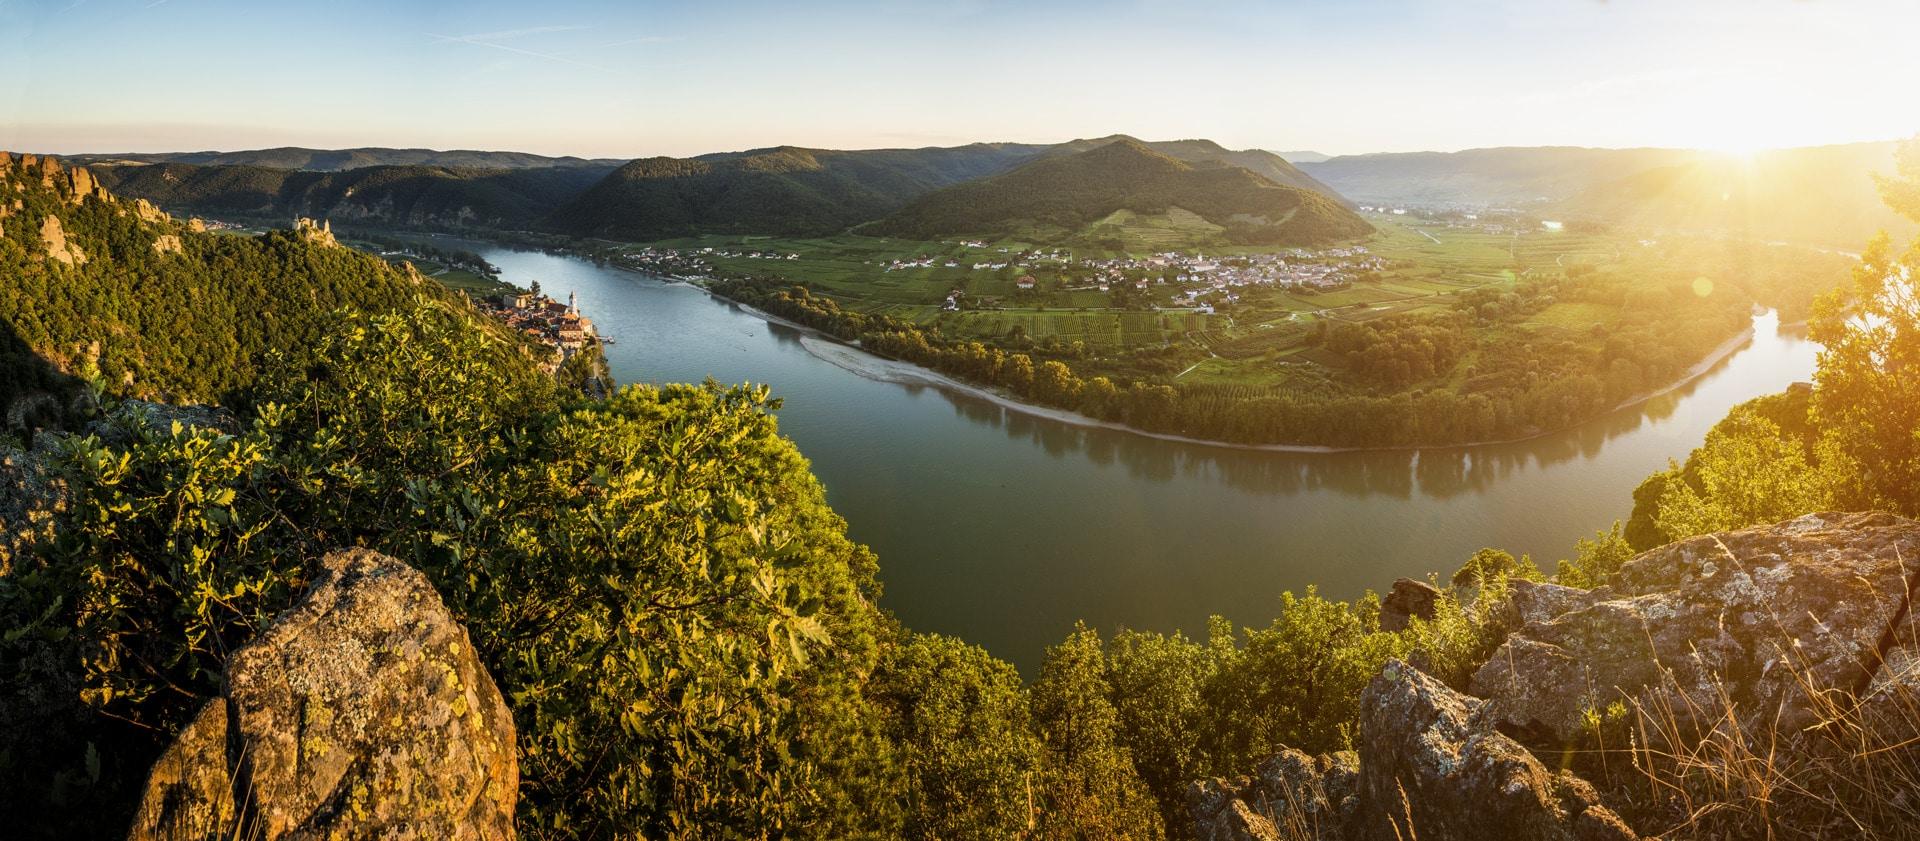 Wachau - Donau